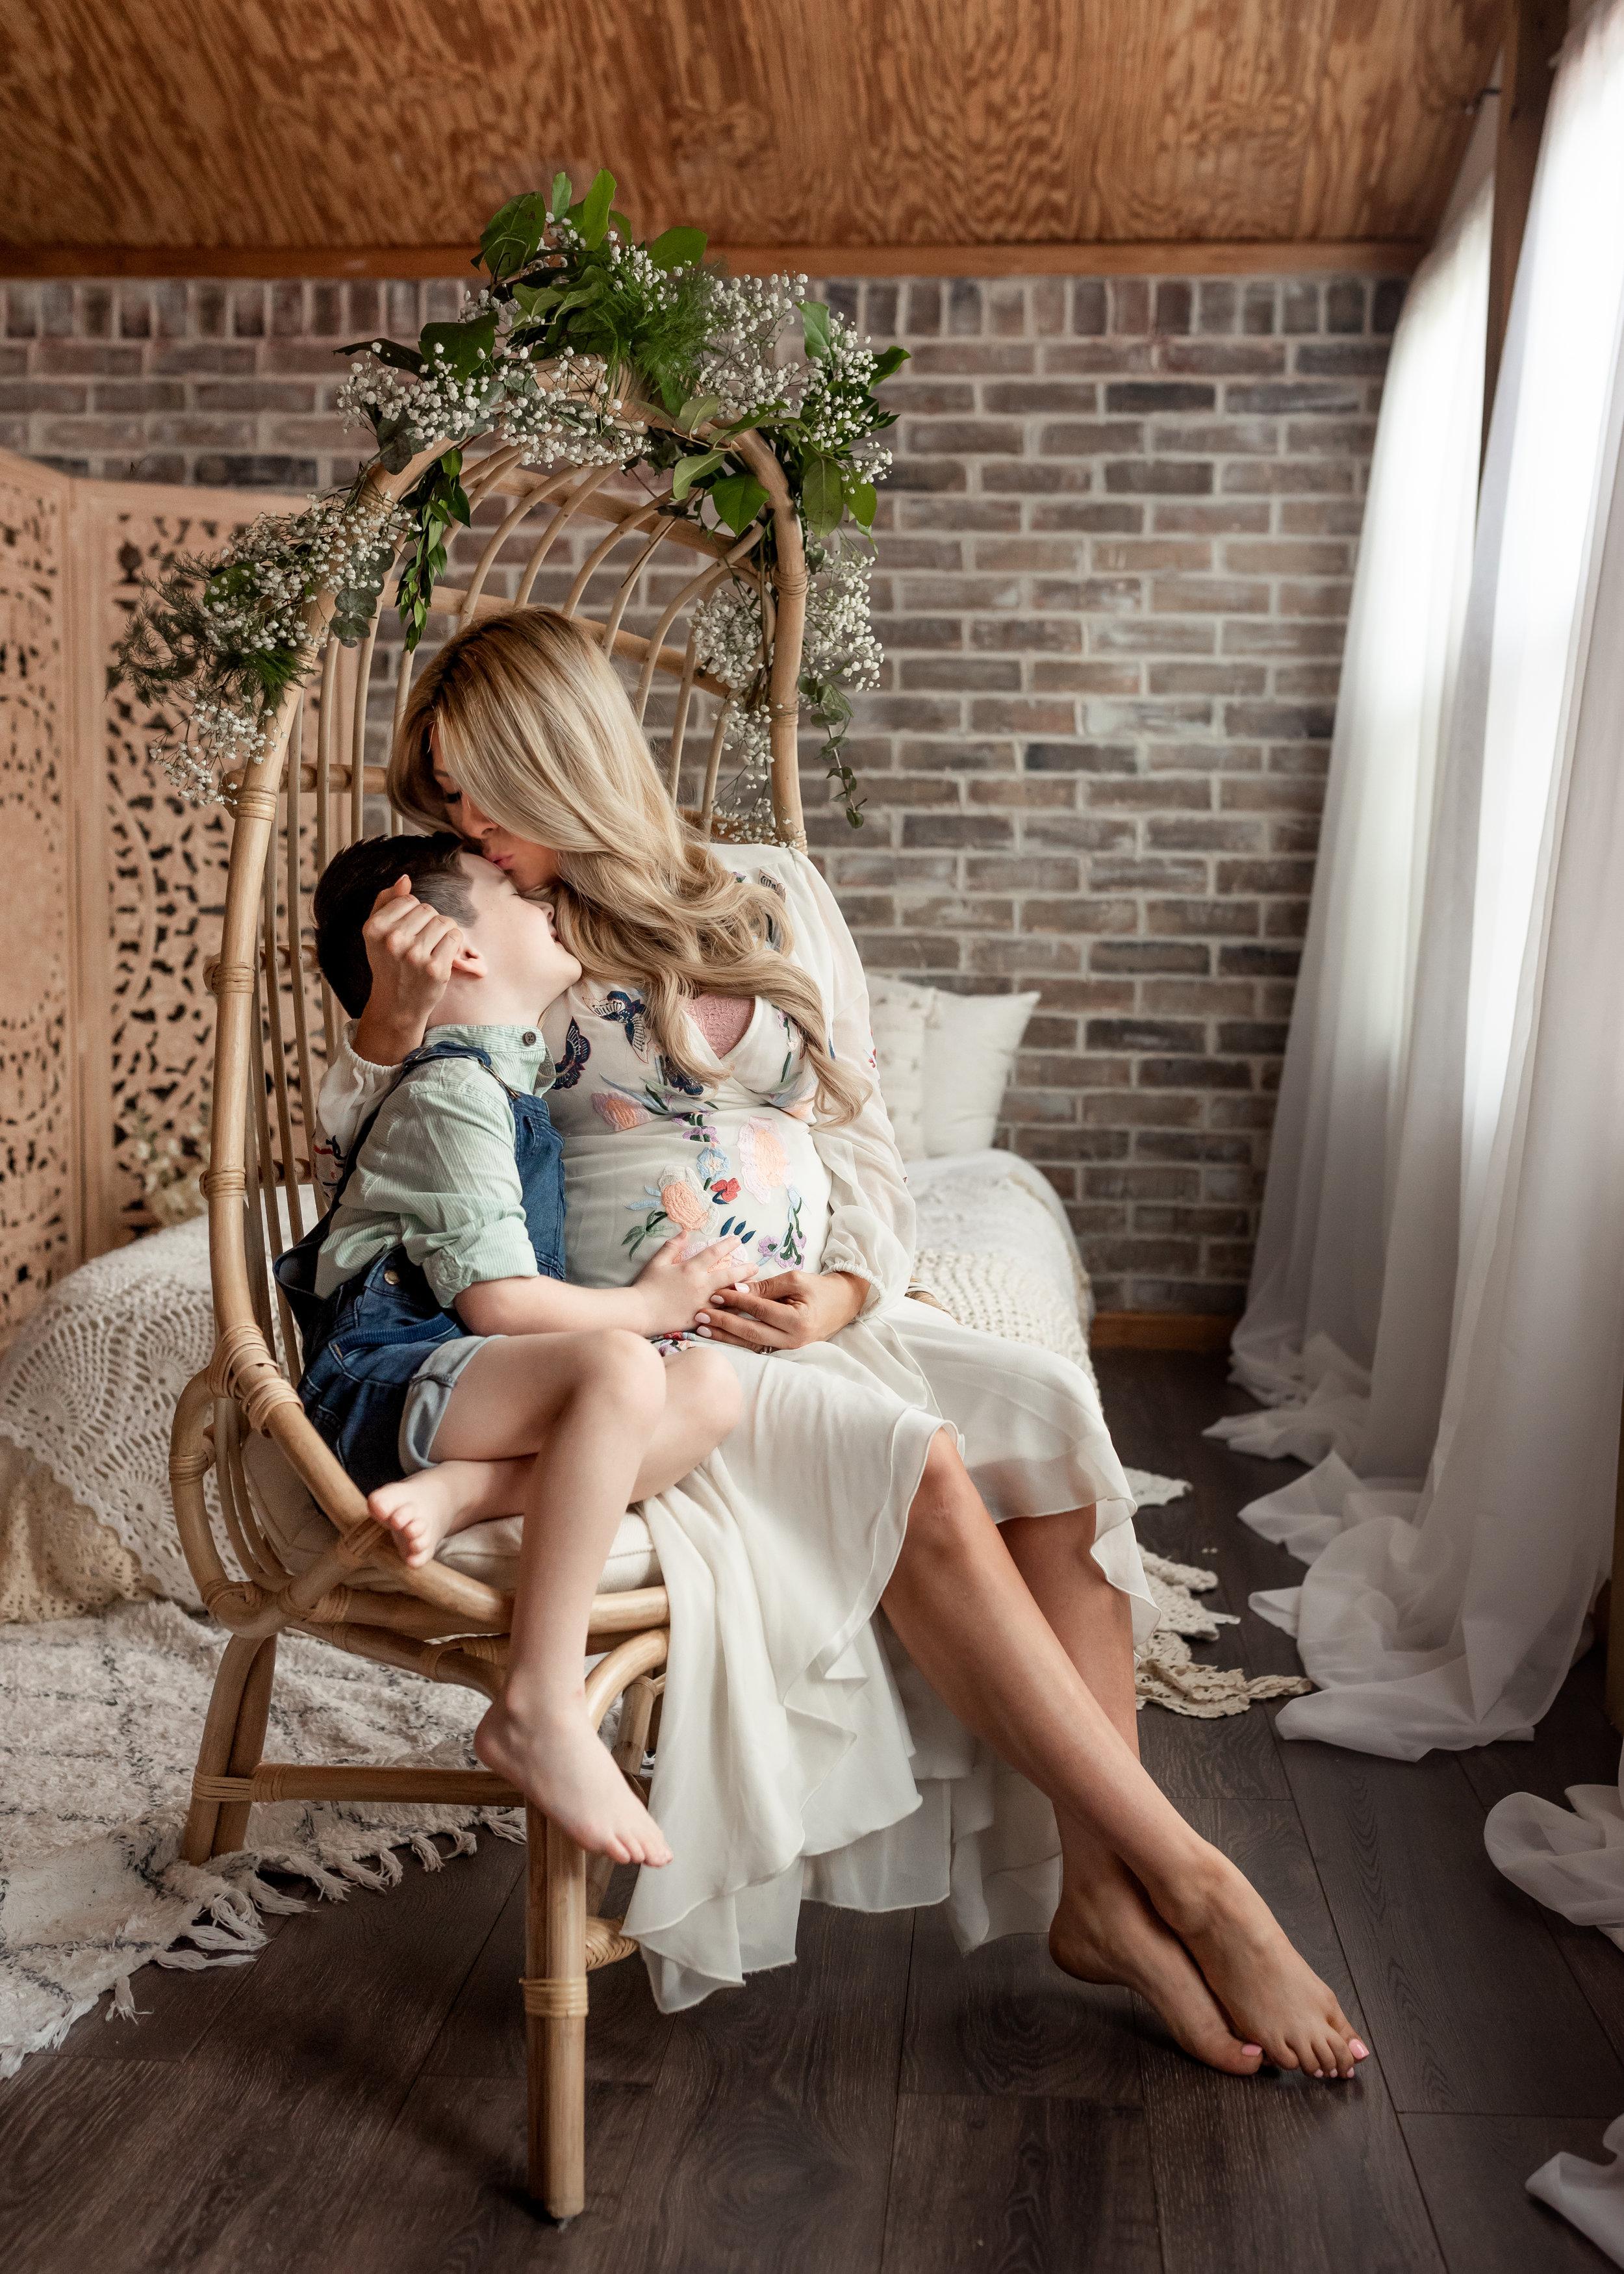 katy-tx-motherhood-photographer-houston-mommy-me-session-studio.jpg